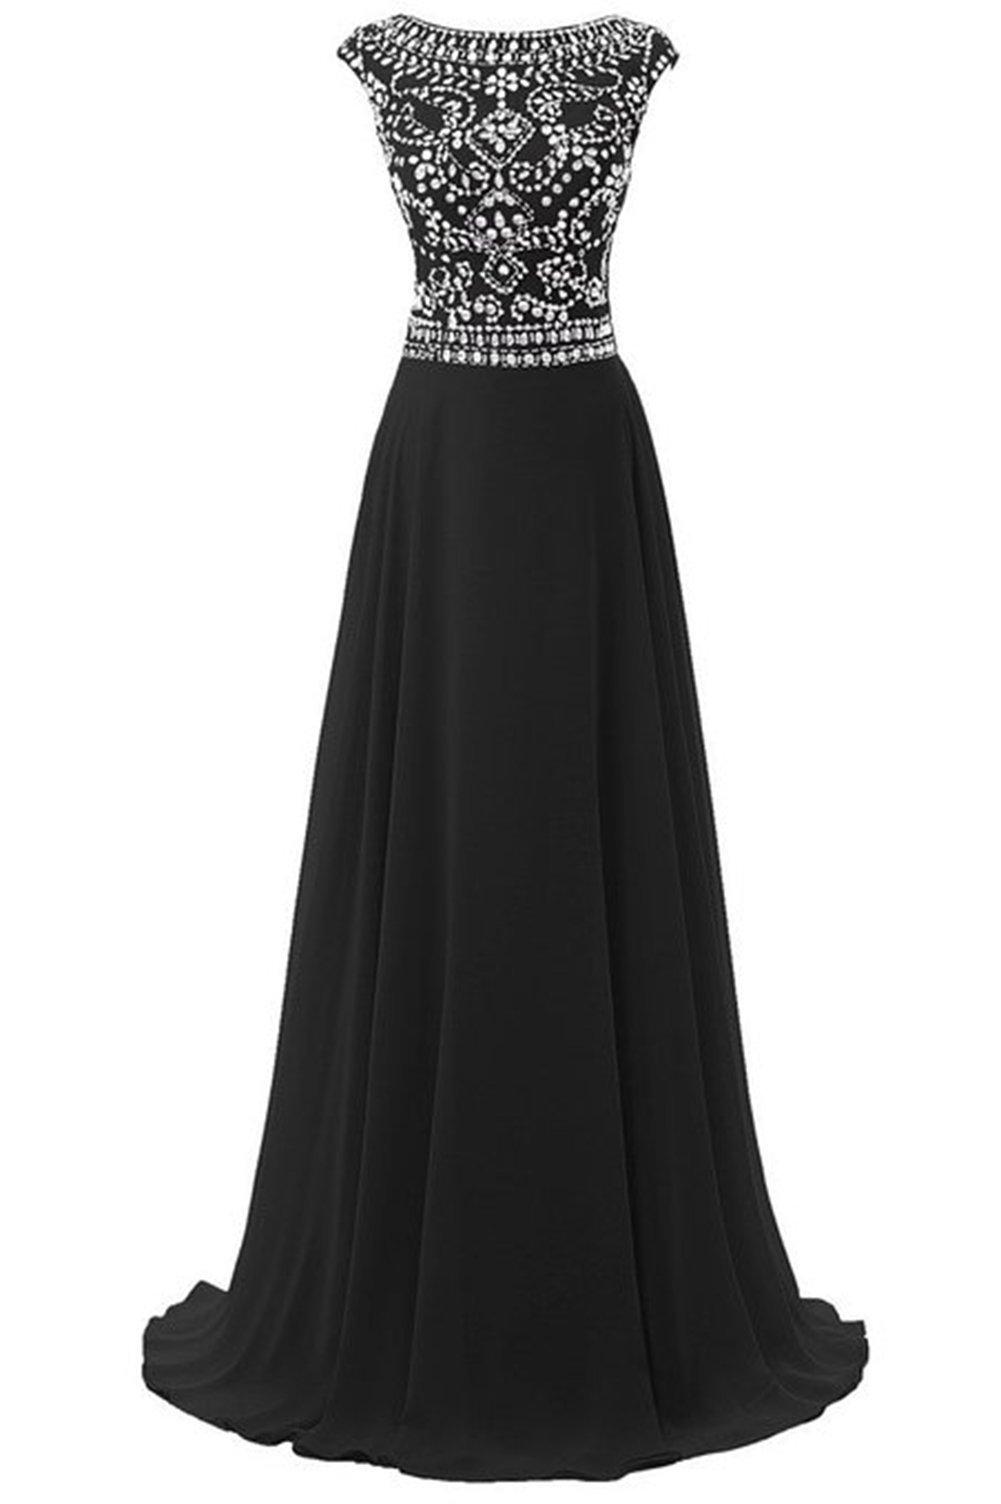 R&J Bridesmaid Floor Length Elegant Cap Sleeve Prom FormalEvening Dress Black Size 16